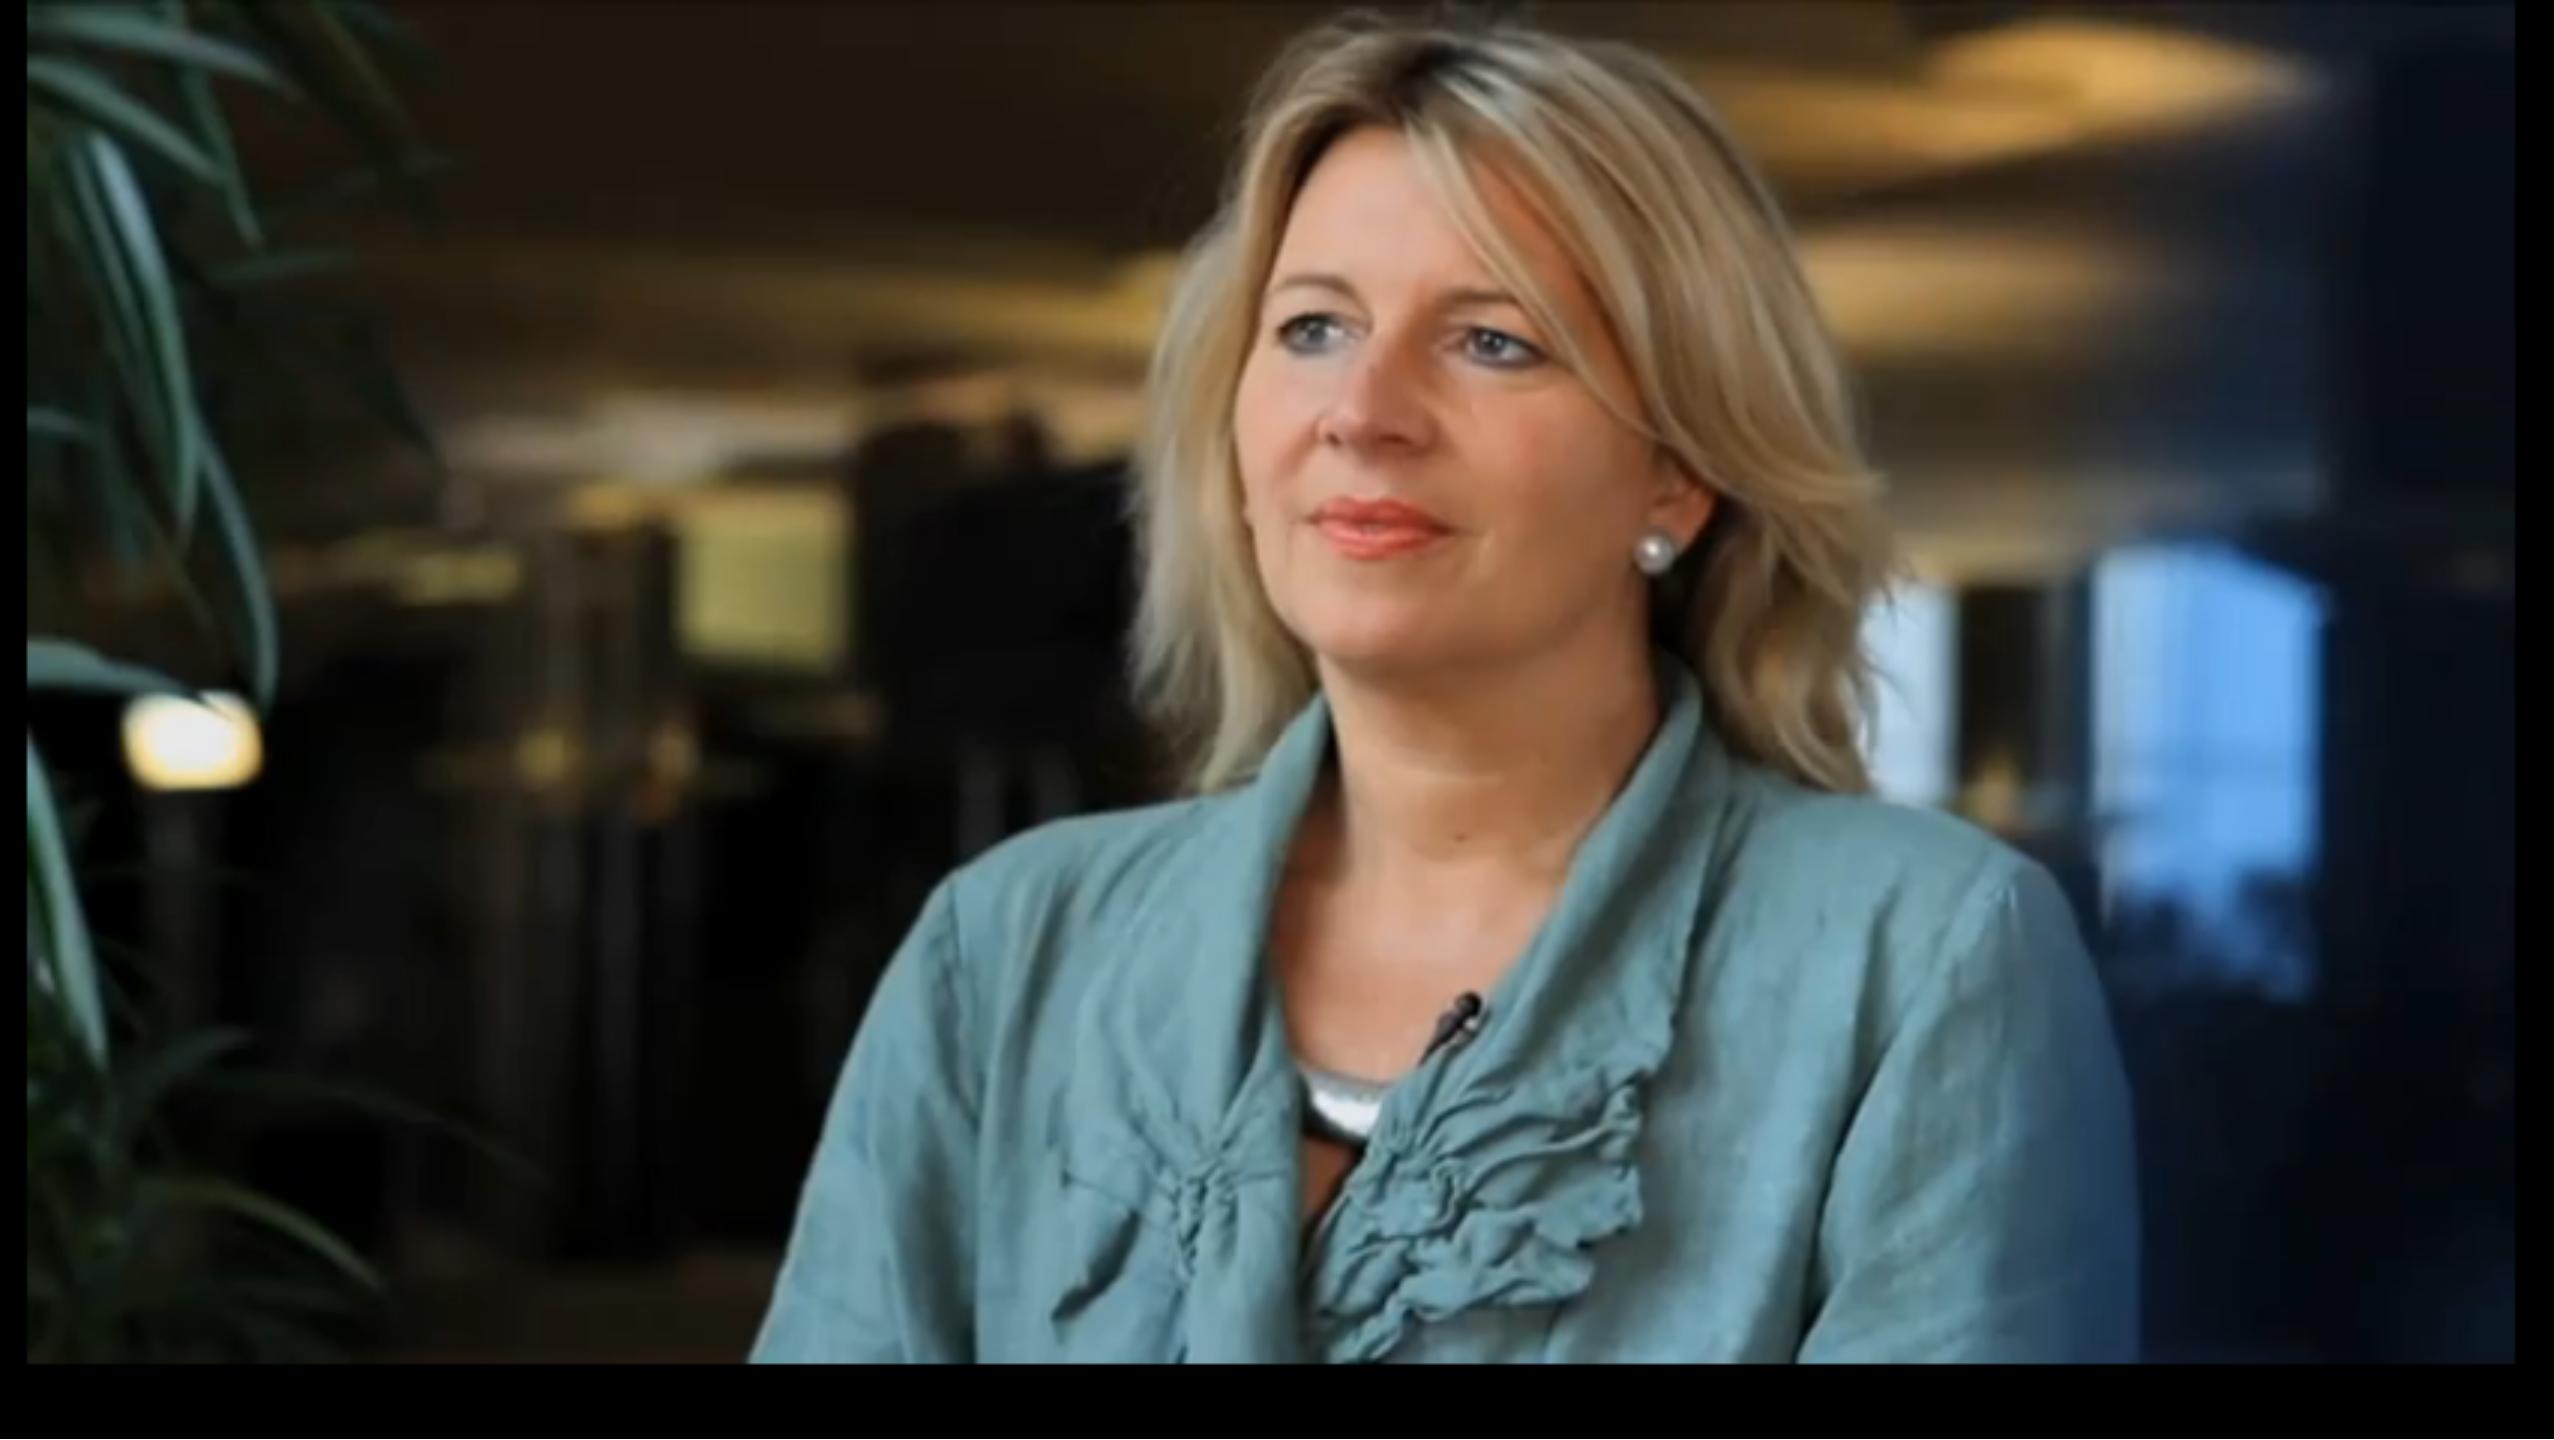 Krisztina Morvai, du parti Jobbik hongrois